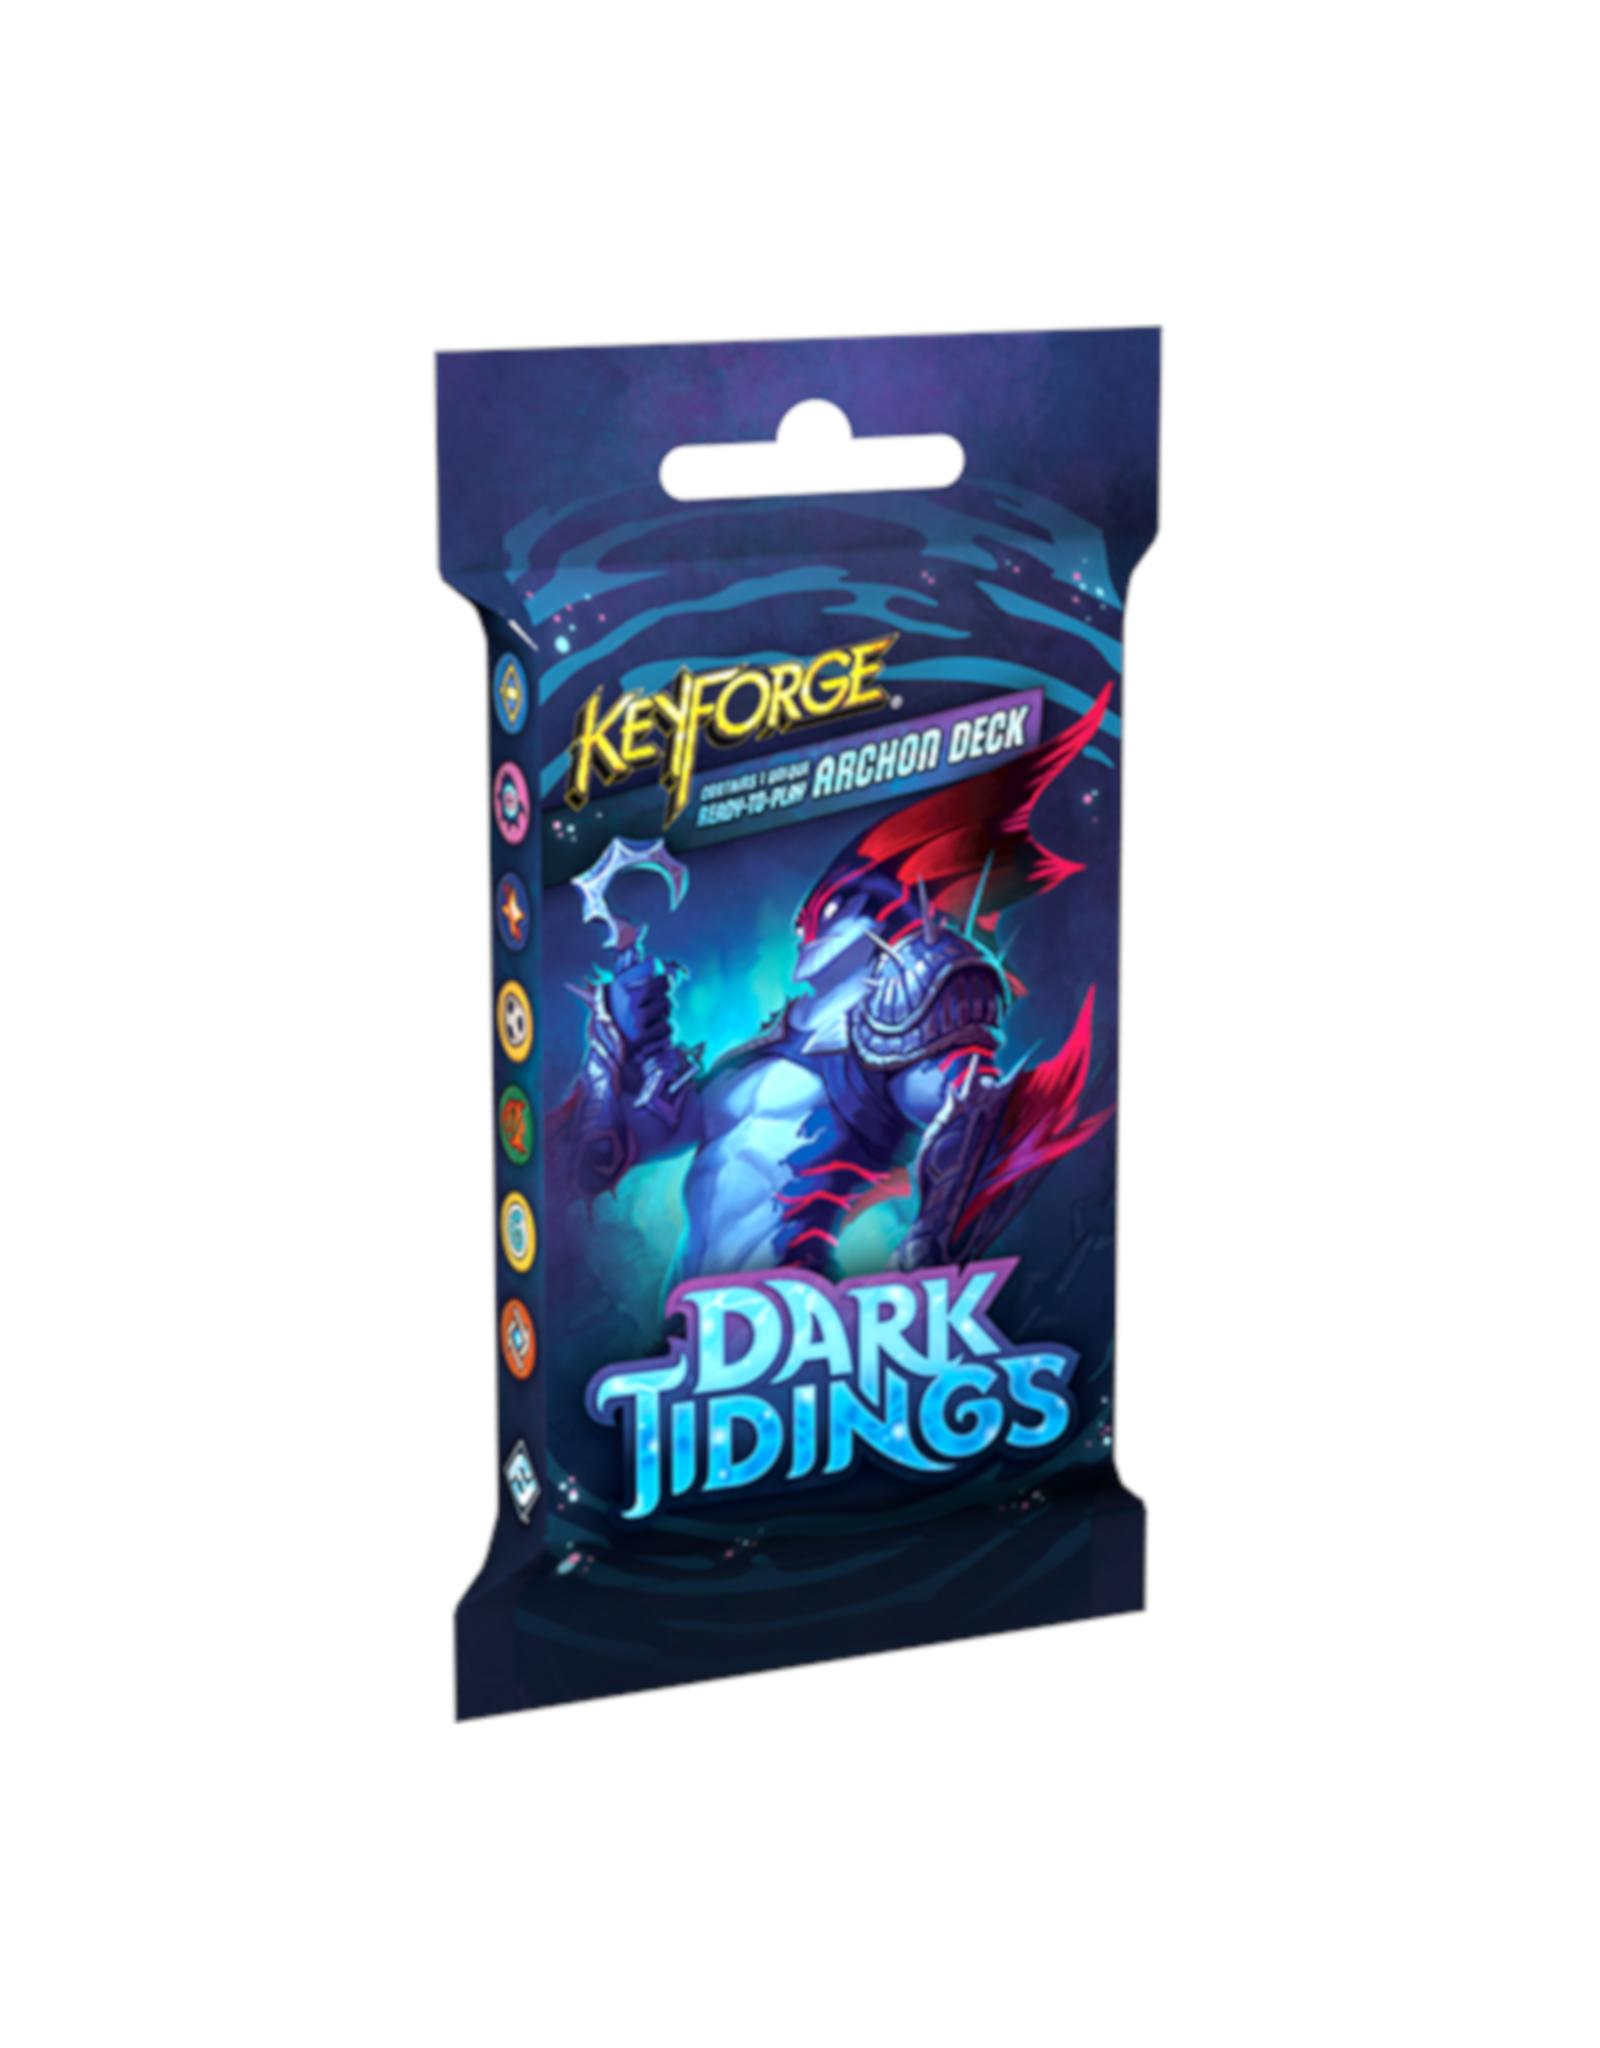 Fantasy Flight Games Keyforge Dark Tidings Archon Deck